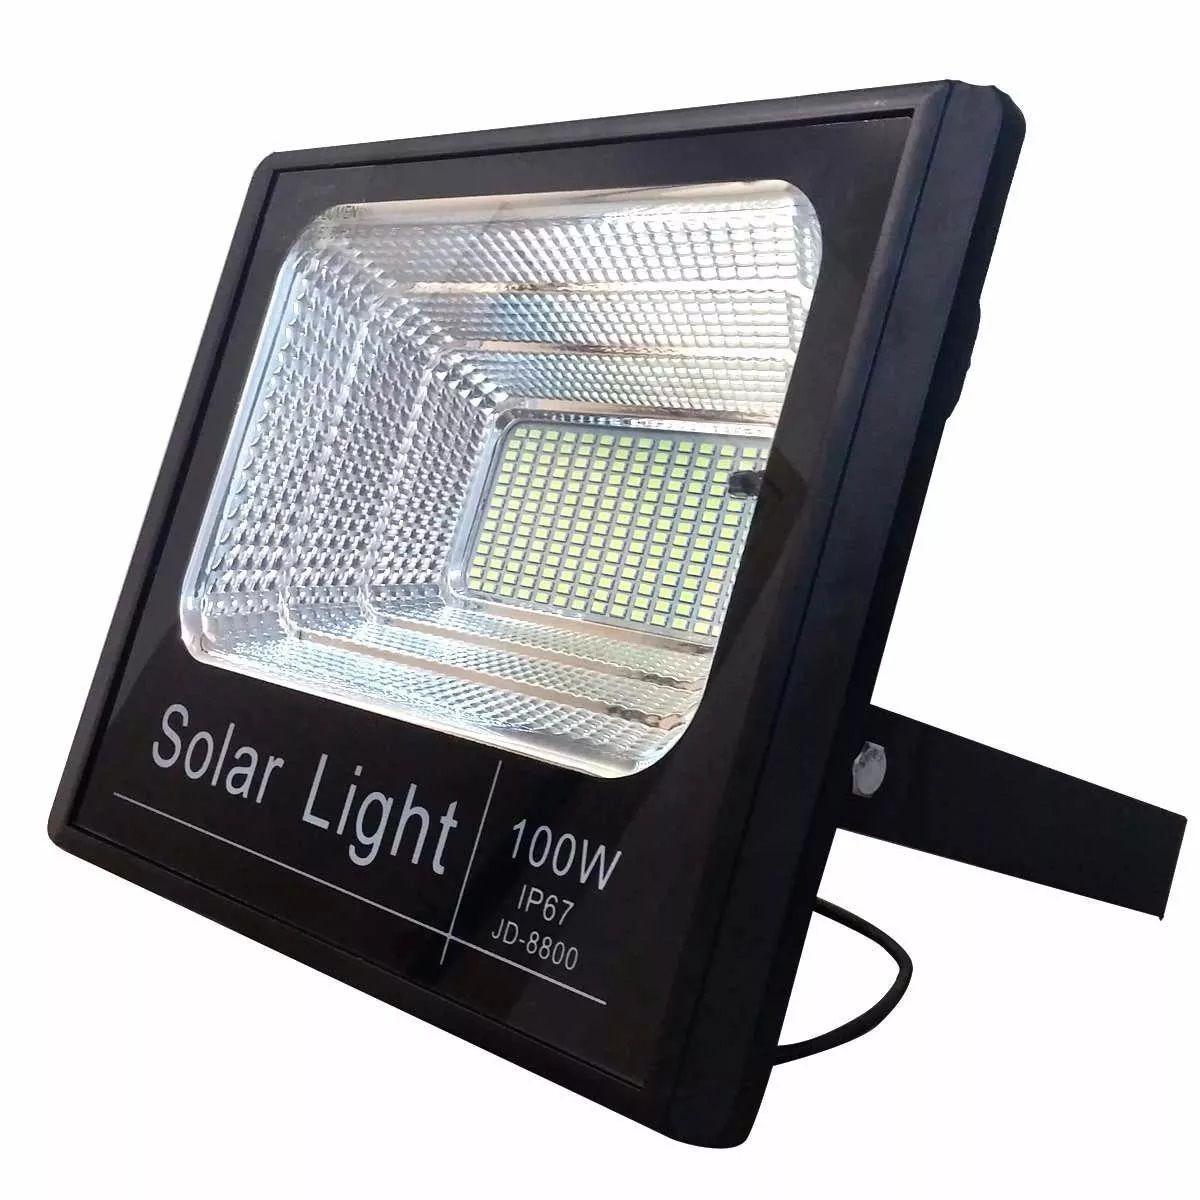 Refletor Holofote Led Solar 100w Real Placa Completo  - a3mmagazine